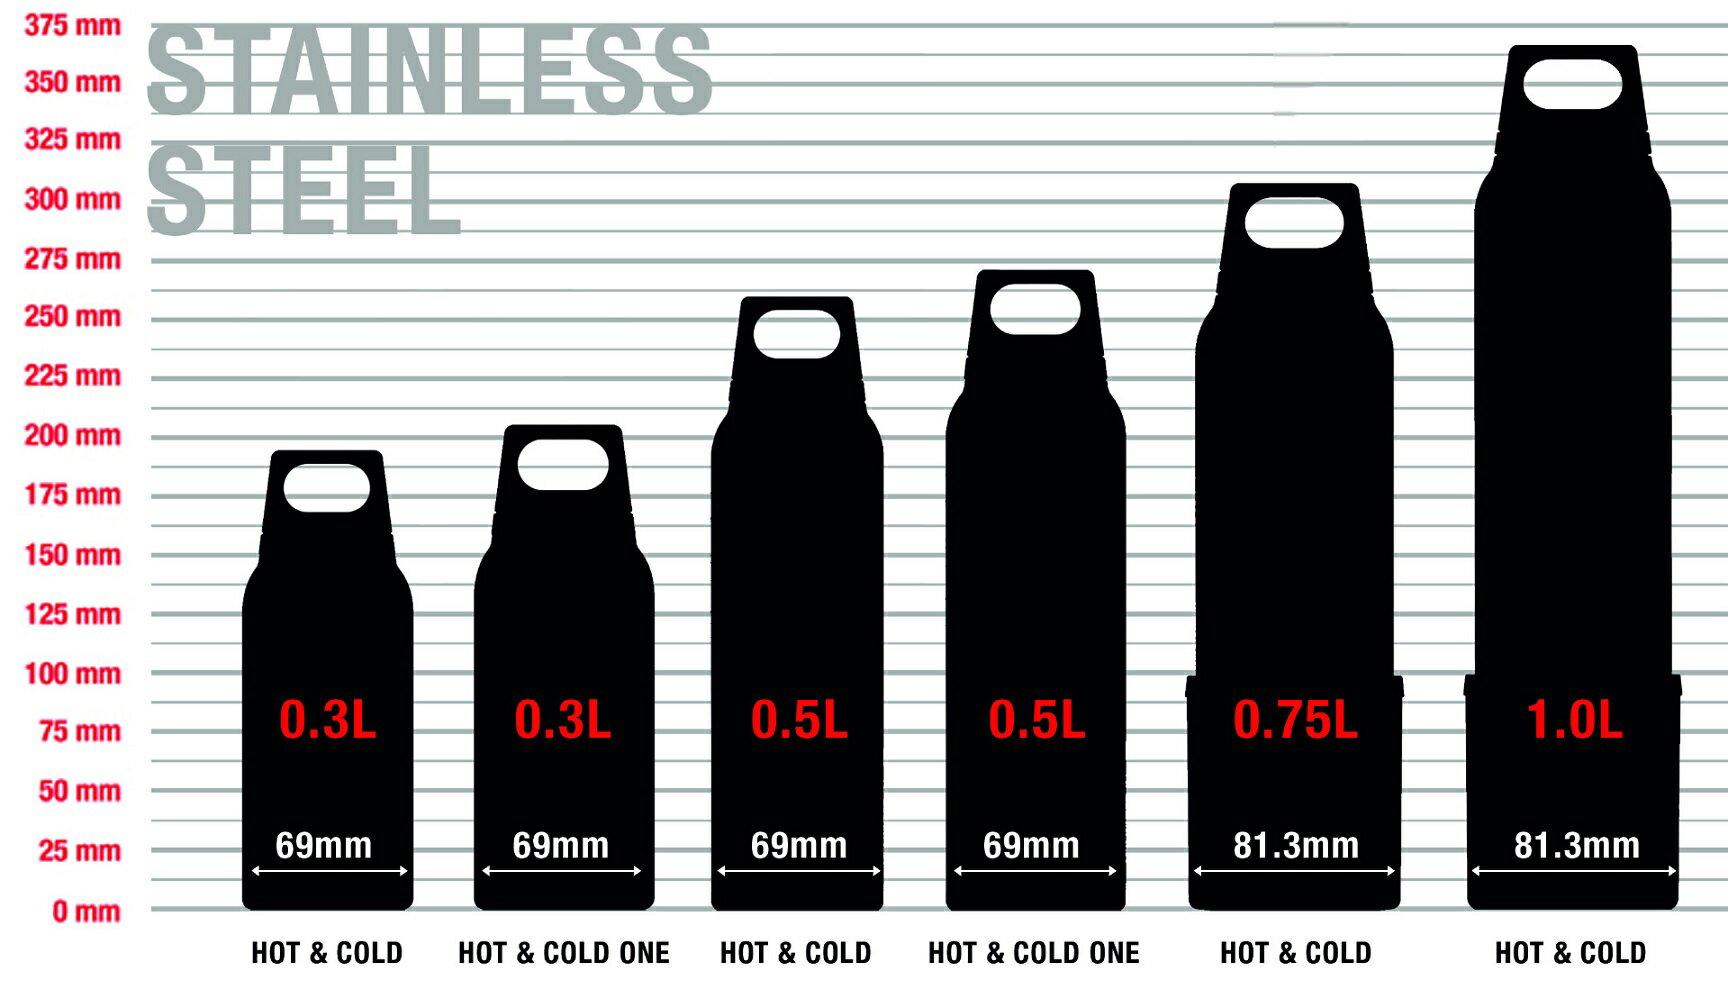 SIGG H&C One 不銹鋼保溫瓶 0.5L 蒂芬妮藍 水壺 保溫瓶 1